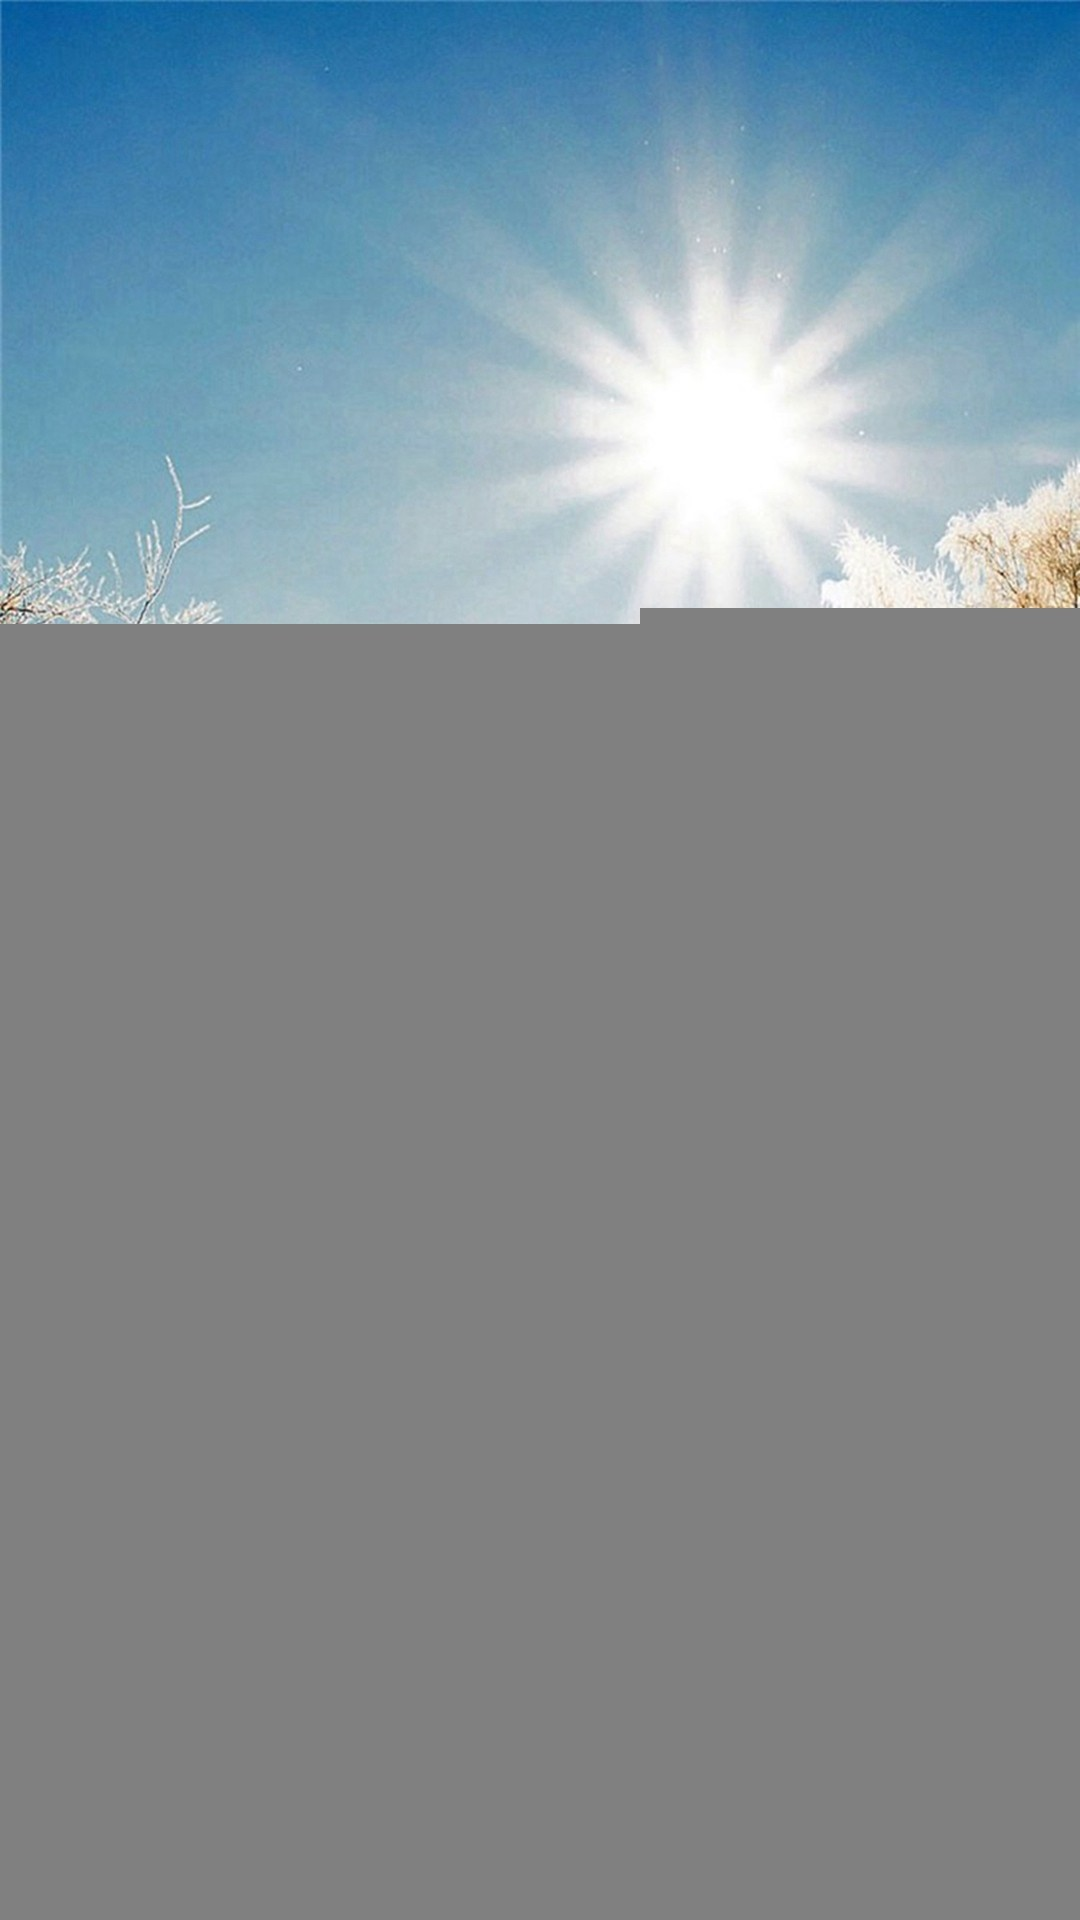 Winter Snowy Sunshine Bright Bench Park iPhone 8 wallpaper